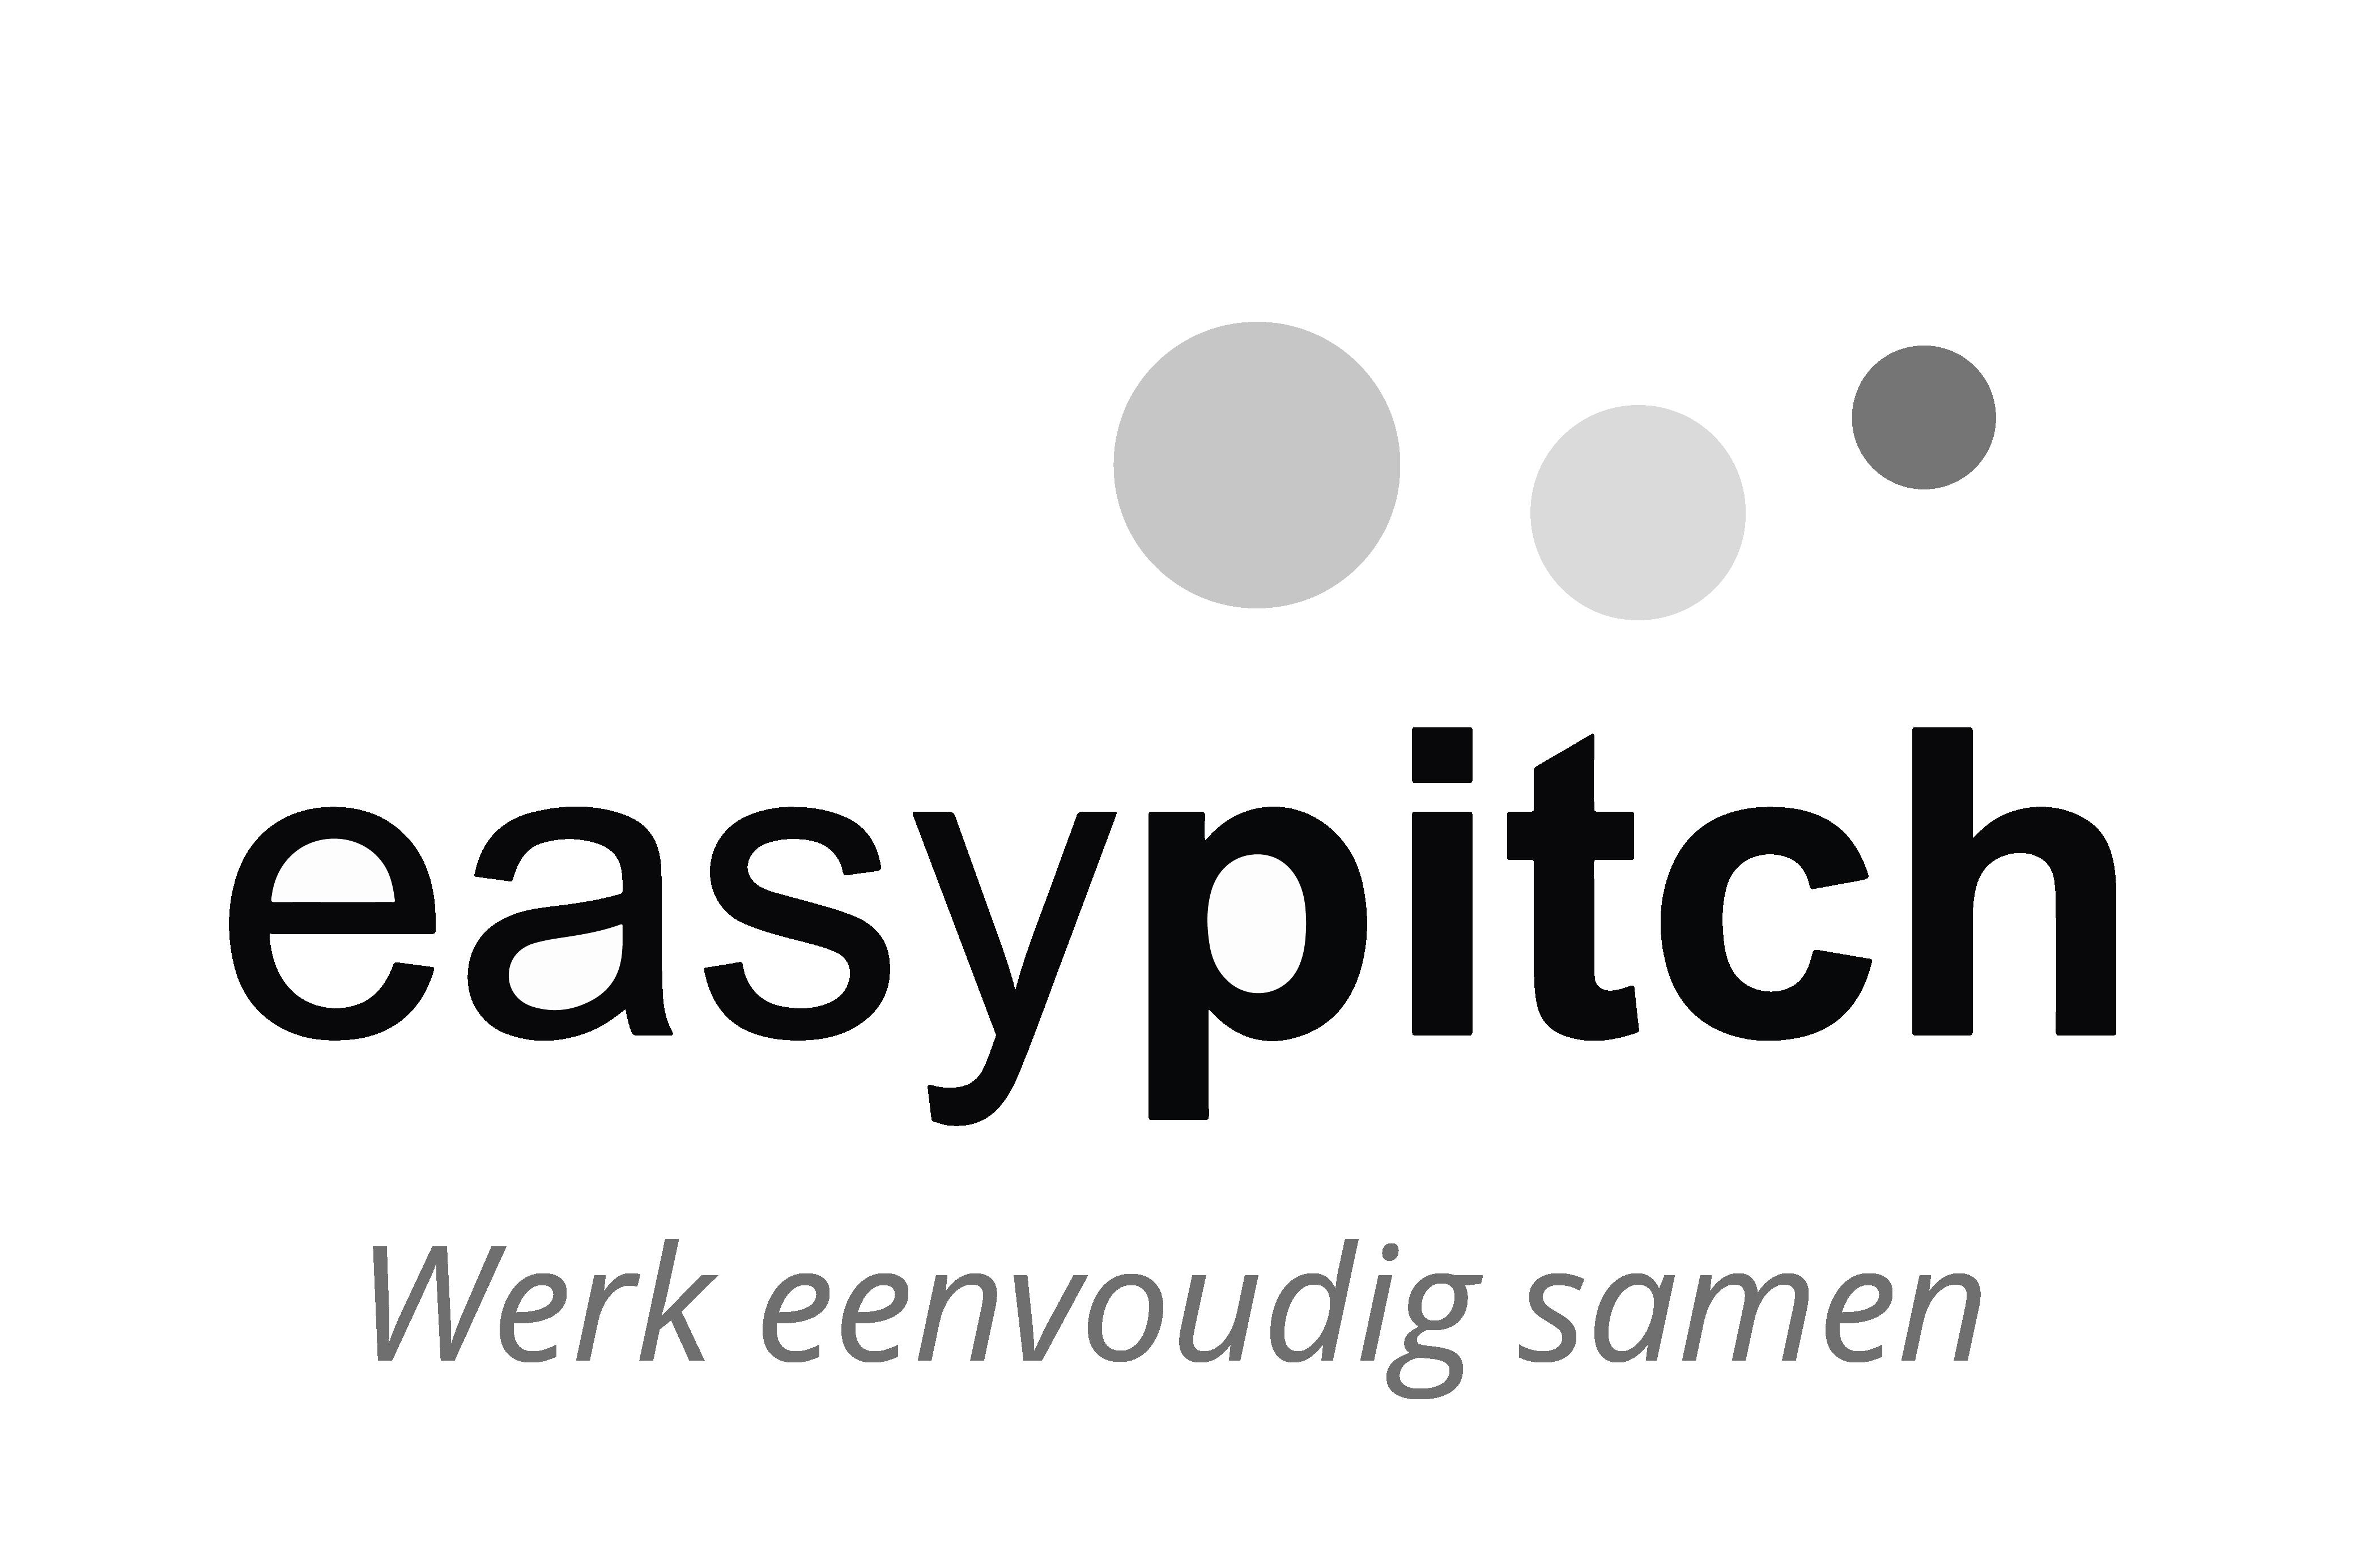 easypitch